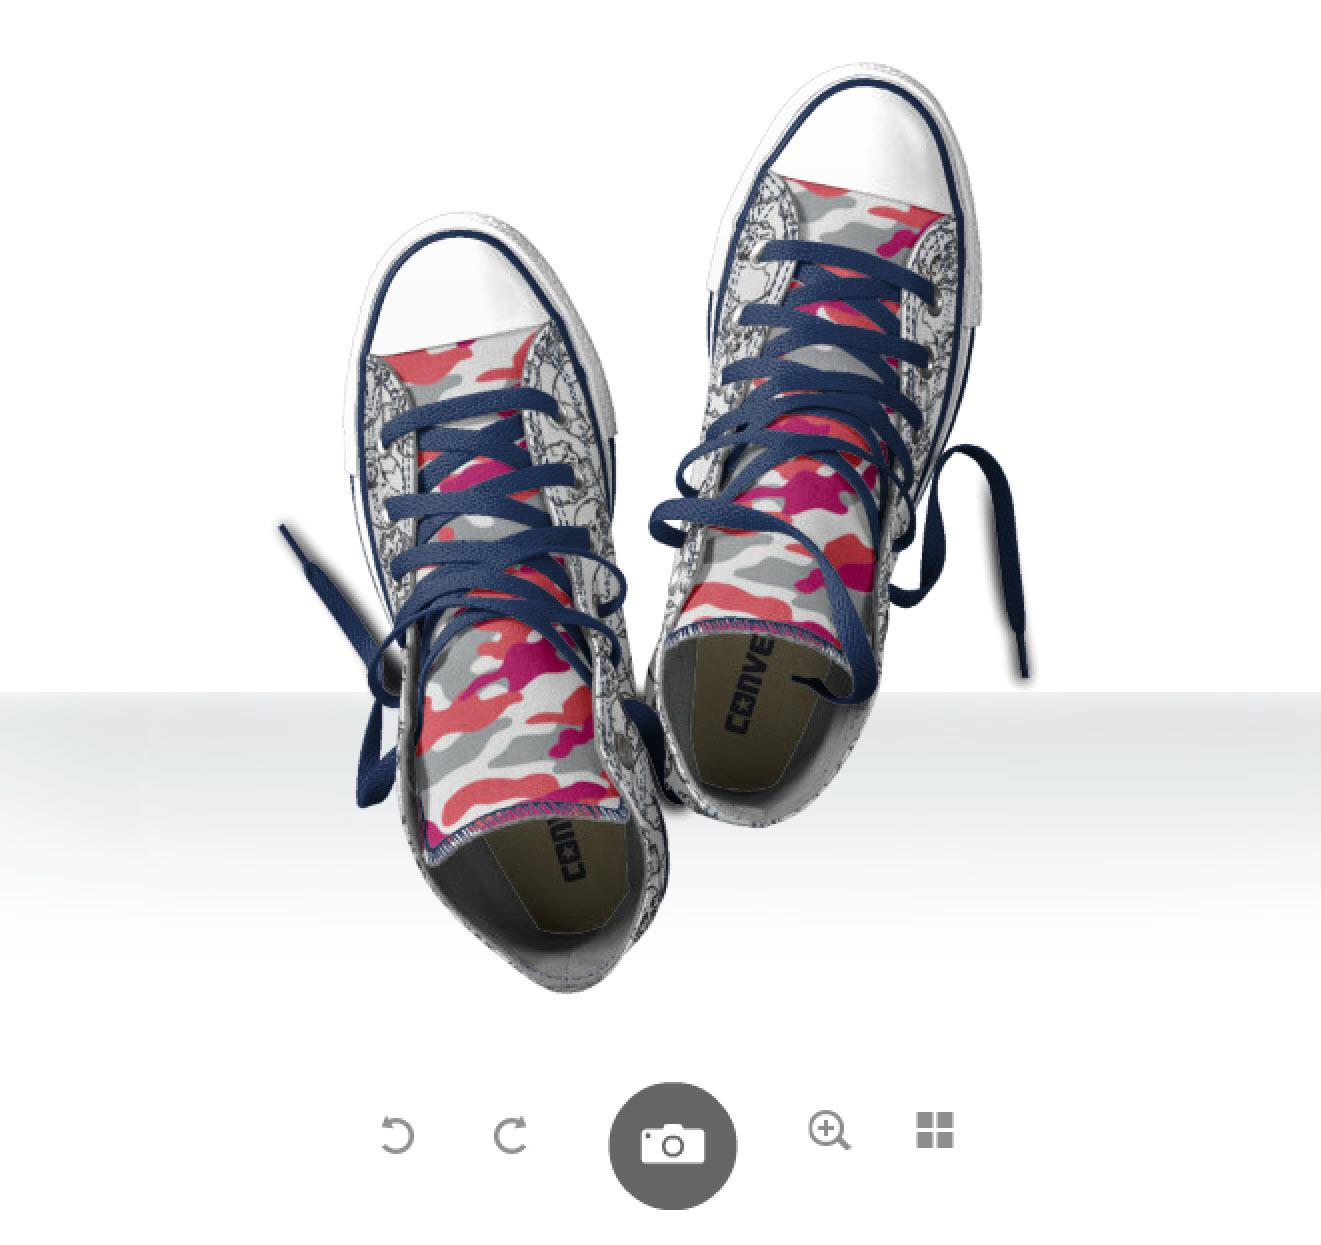 Designa dina Converse, bild ovanifrån!